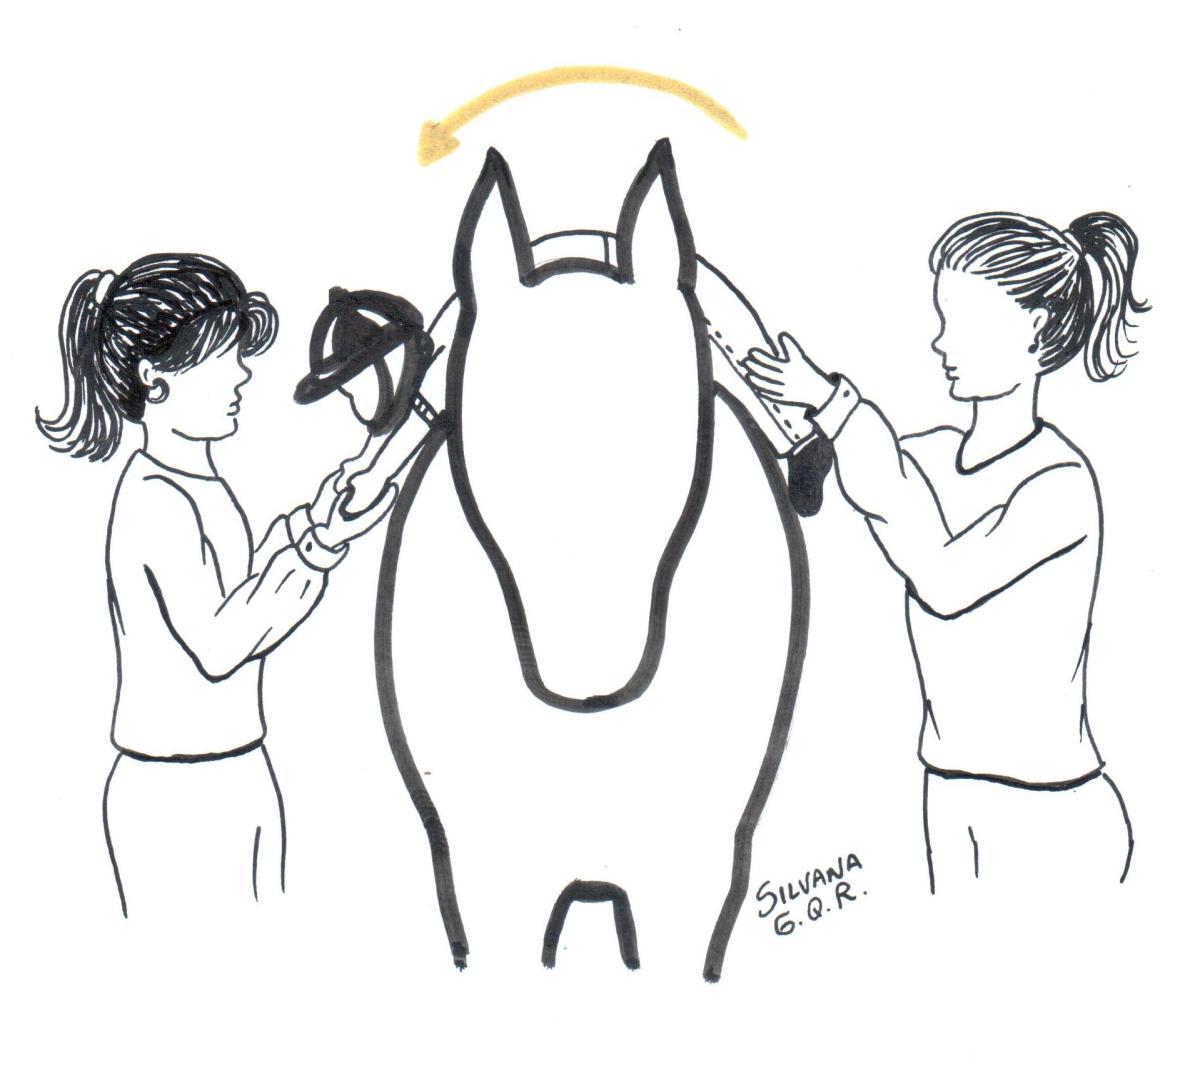 Exercício do jacaré na equoterapia